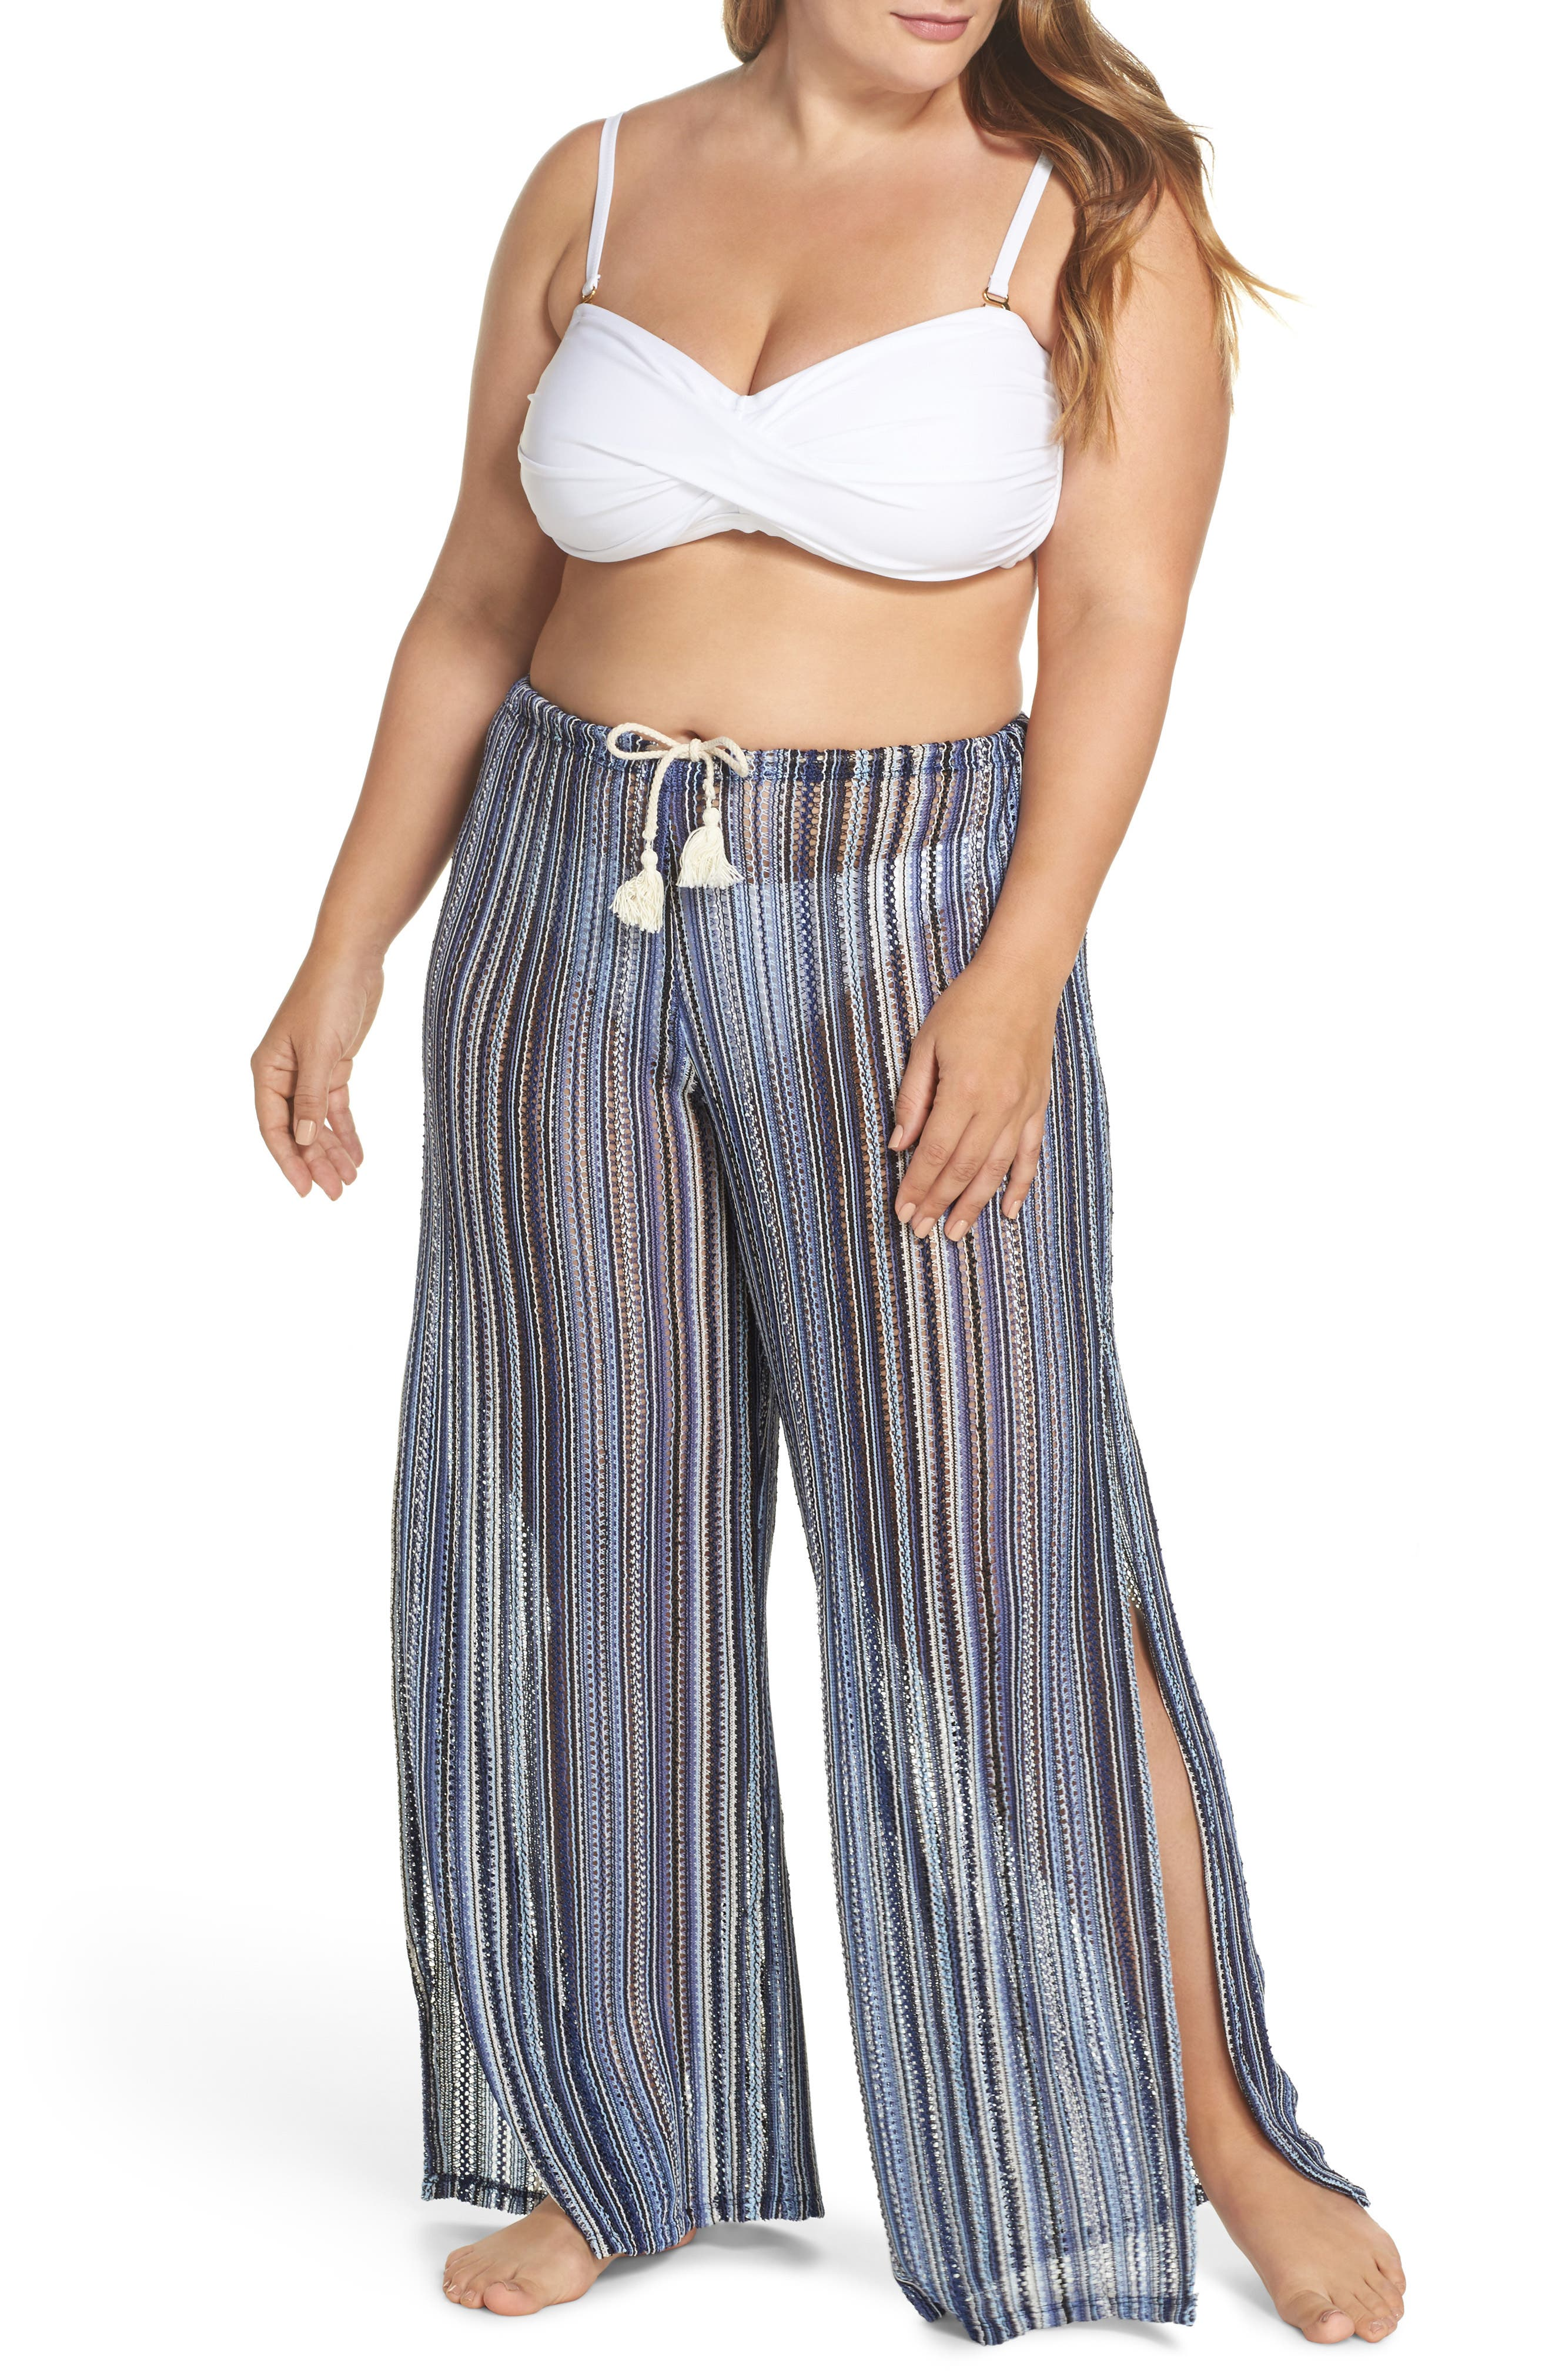 Becca Etc. Pierside Cover-Up Flyaway Pants (Plus Size)